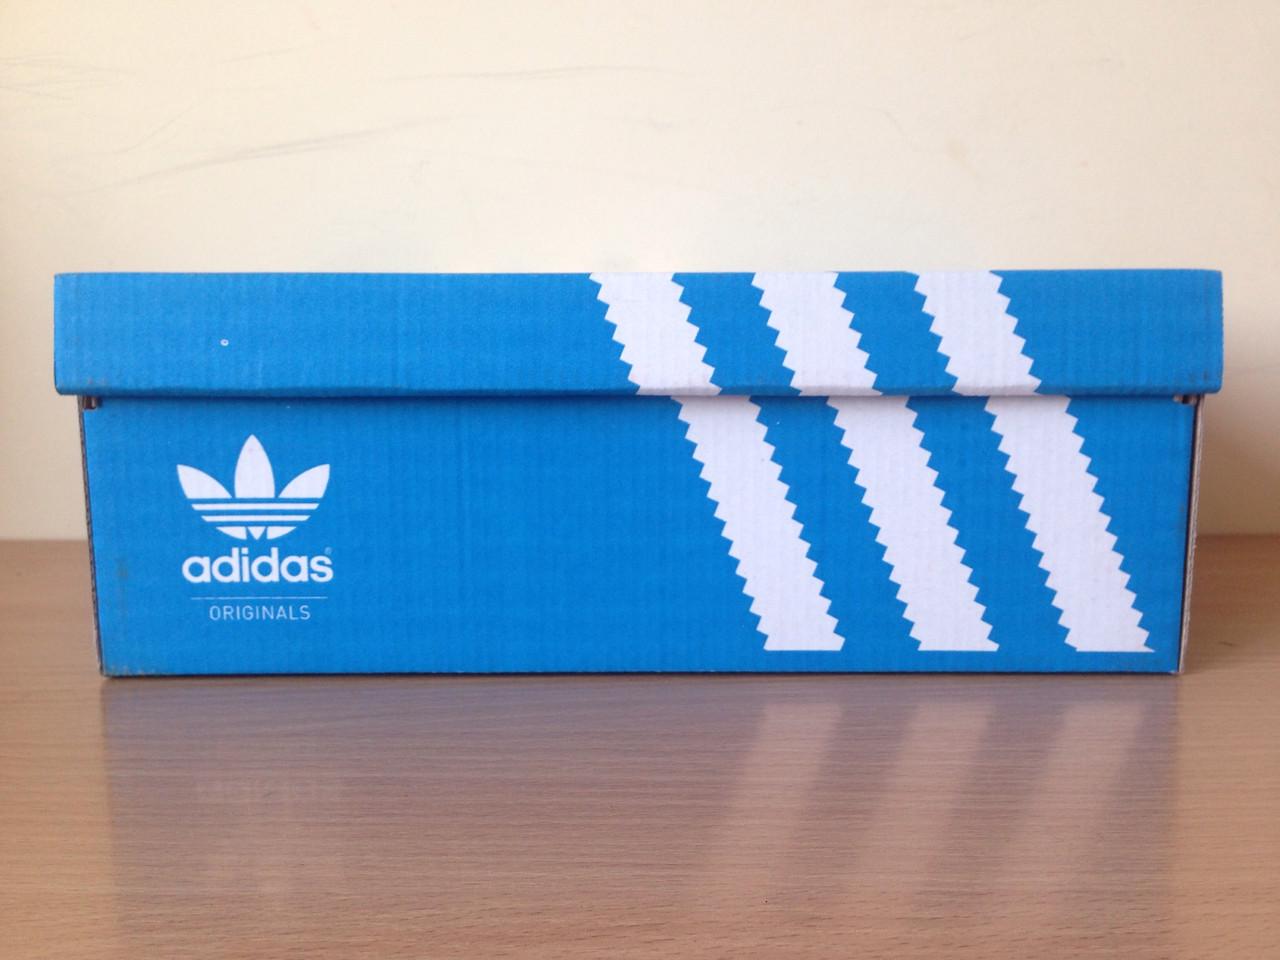 Картинки по запросу коробка для обуви адидас